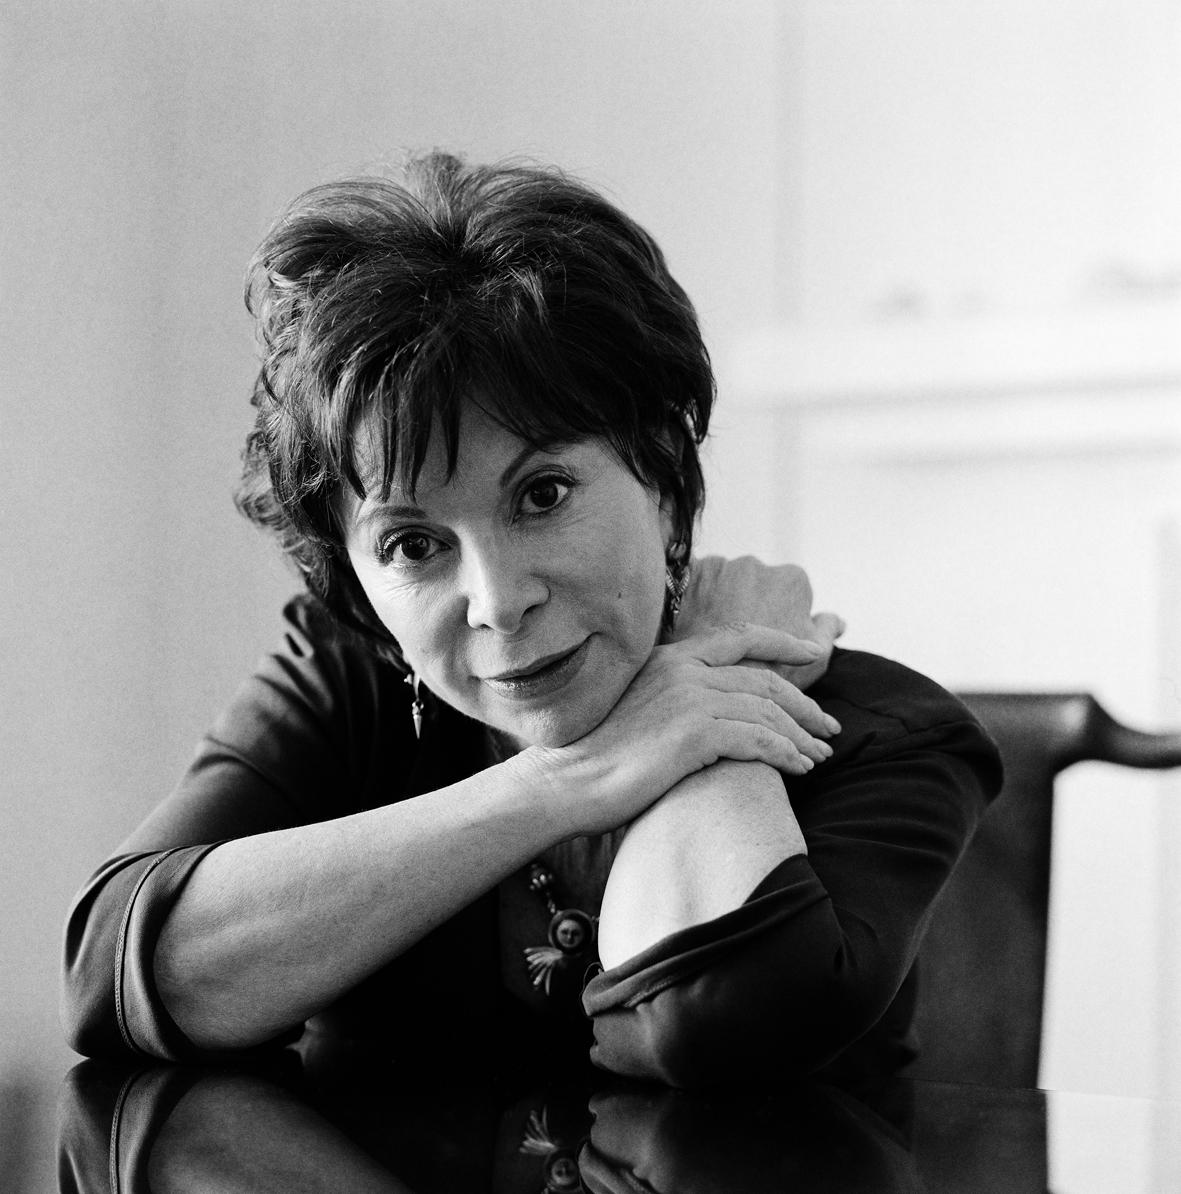 Magical realsim author Isabel Allende